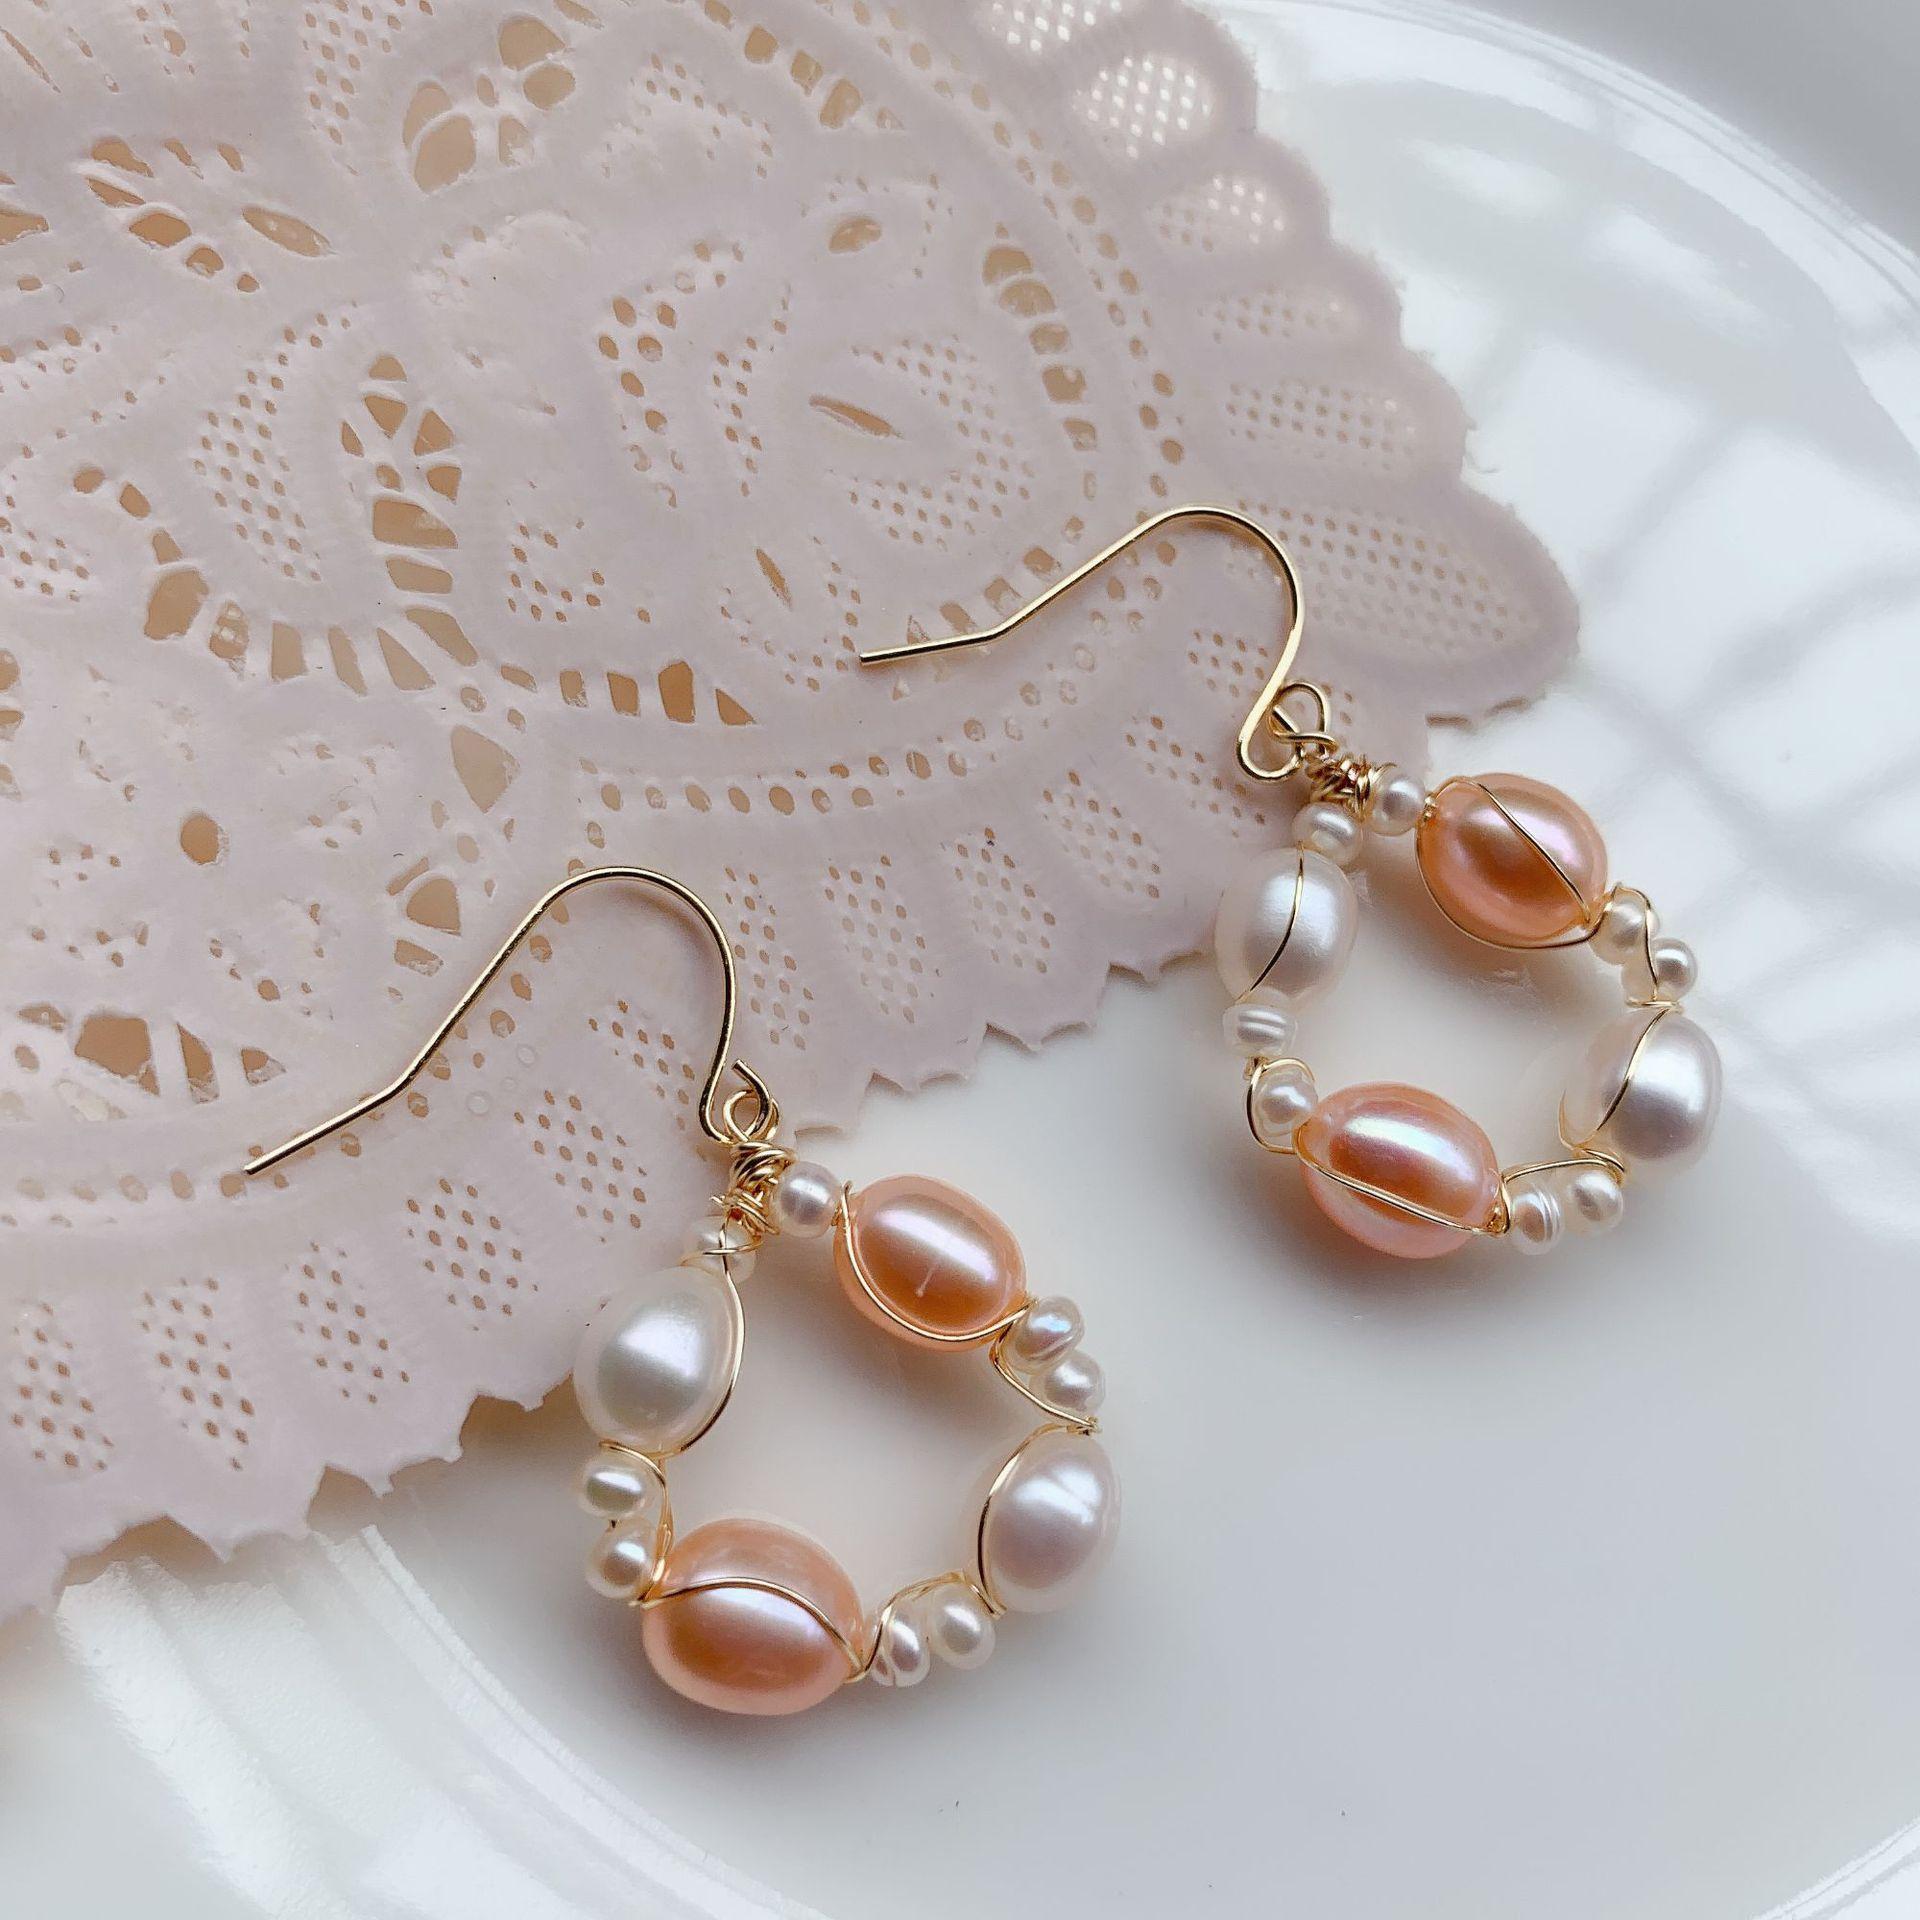 Gold Vintage Natural Pearl Drop Earrings Korea for Women New Fashion 2019 Pendientes Aretes De Perlas Cultivadas